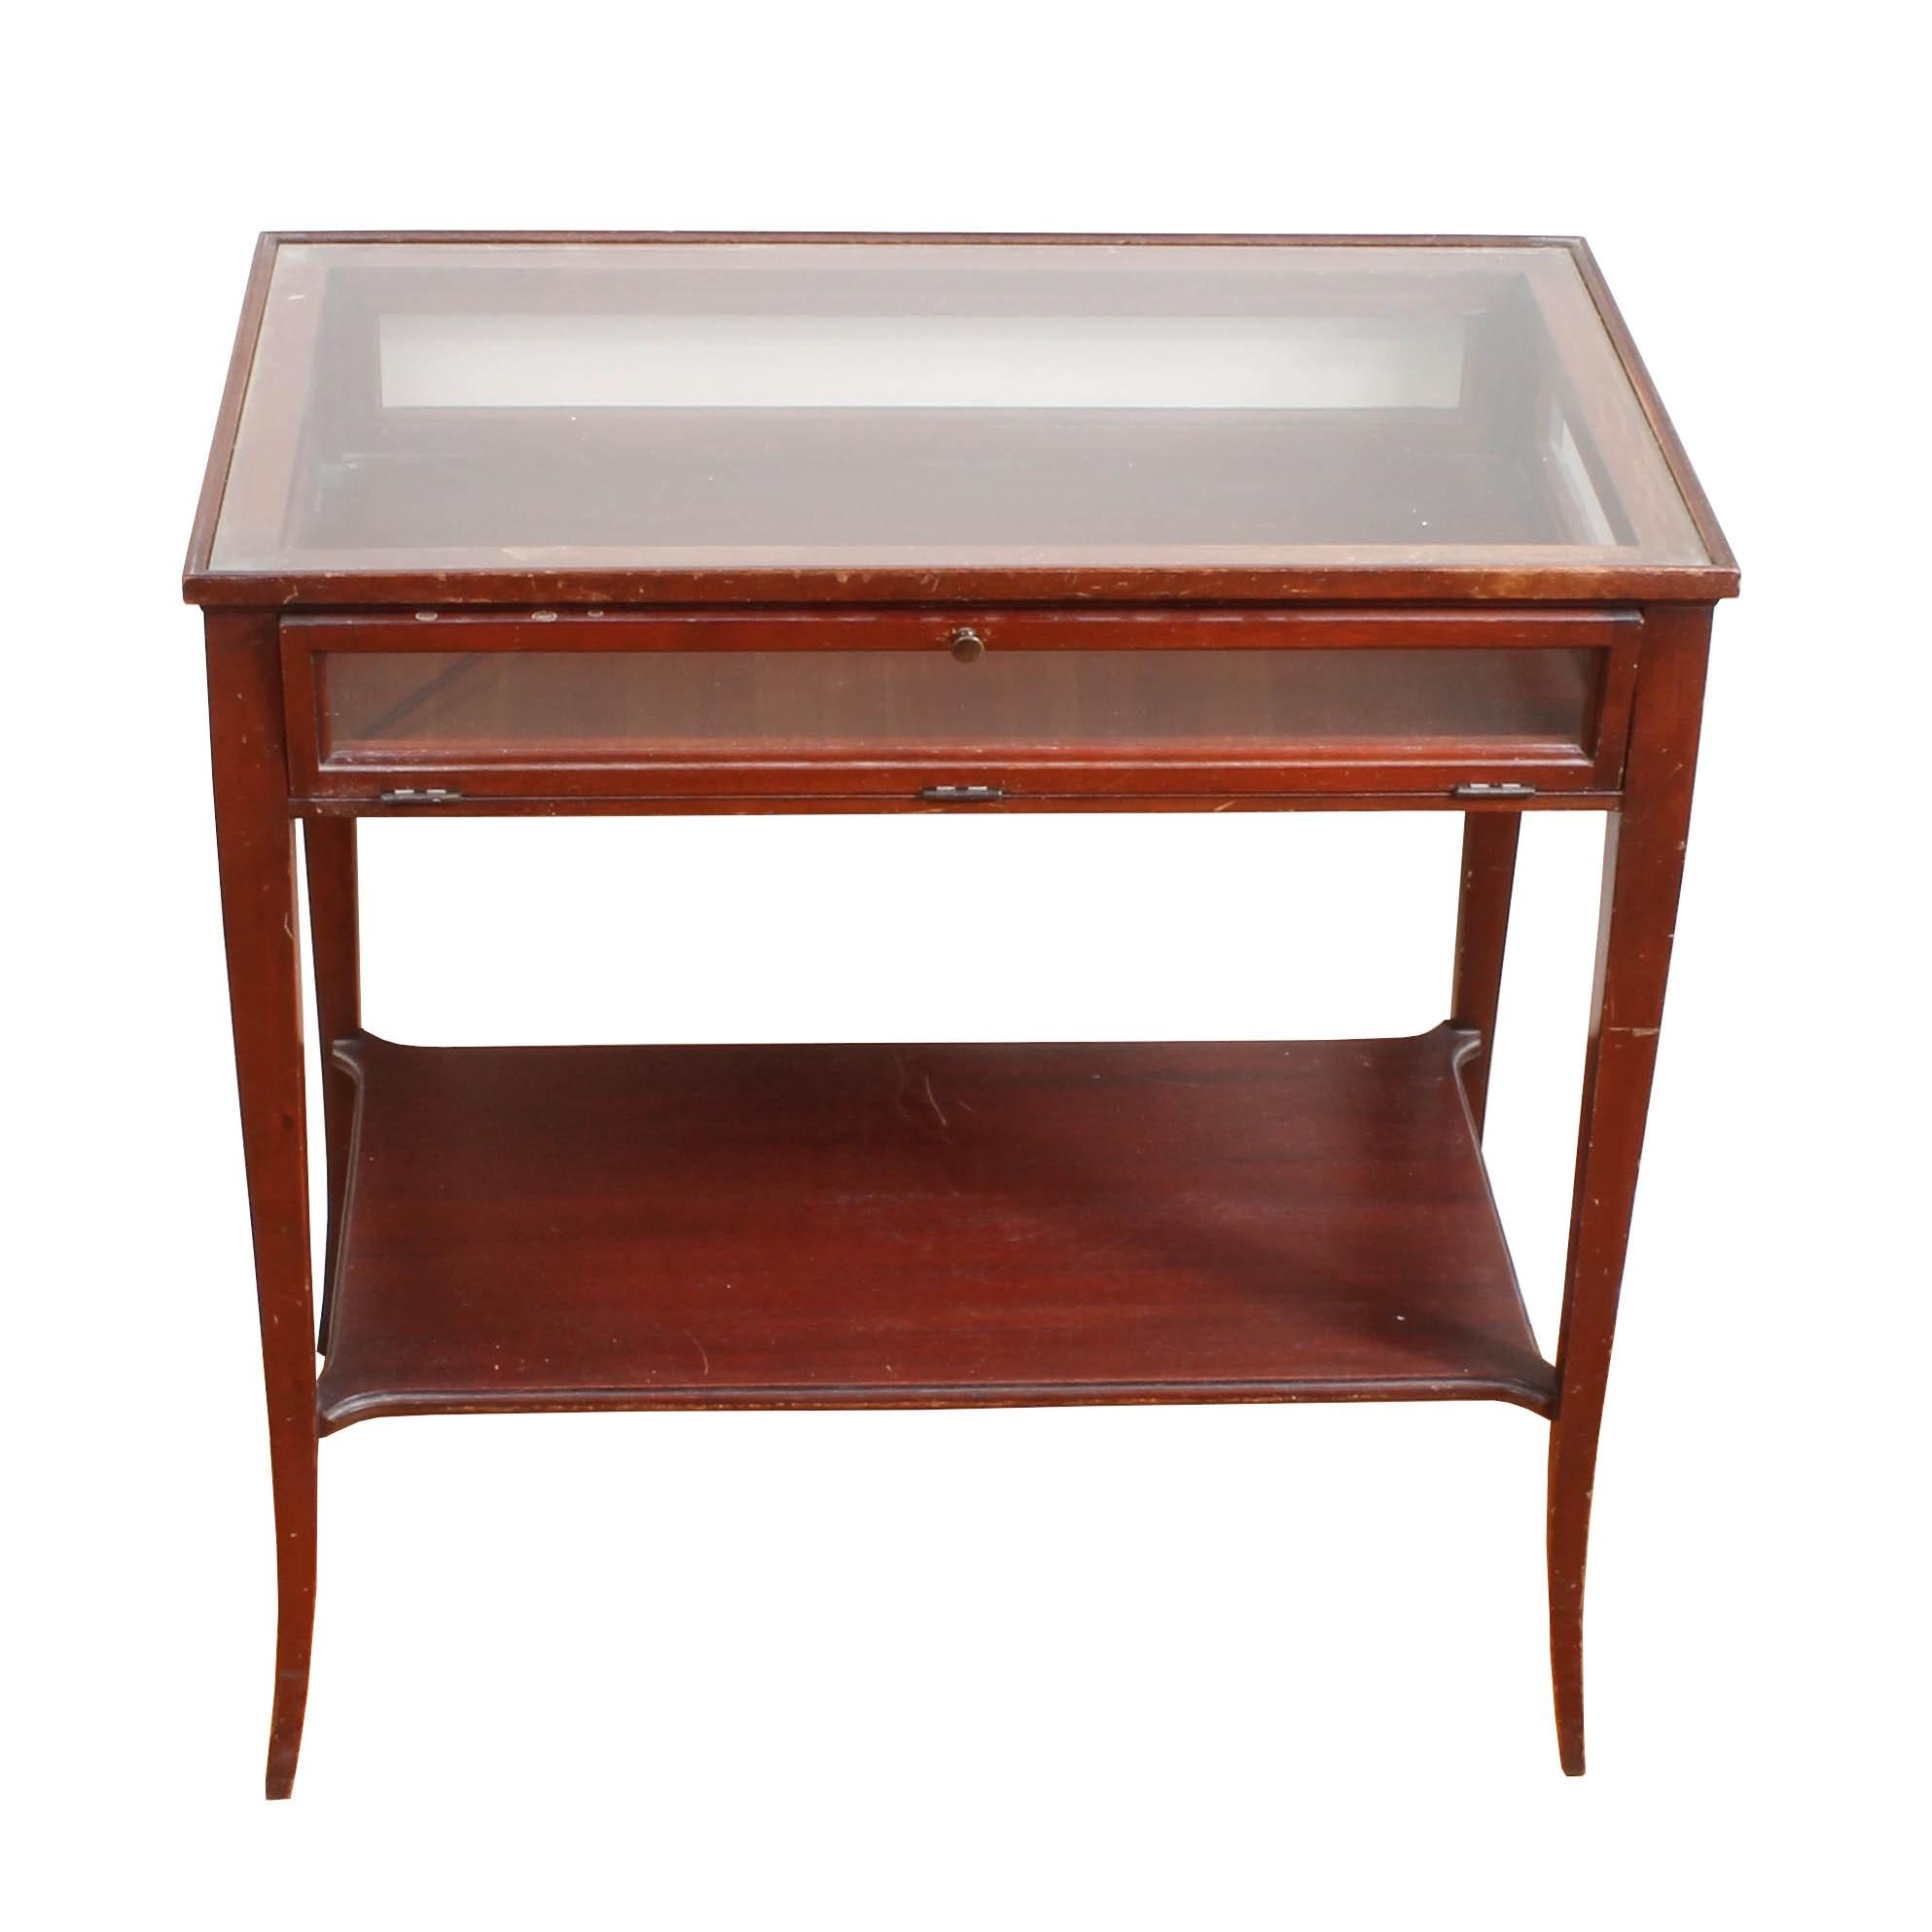 Vintage Glass-Top Display Table